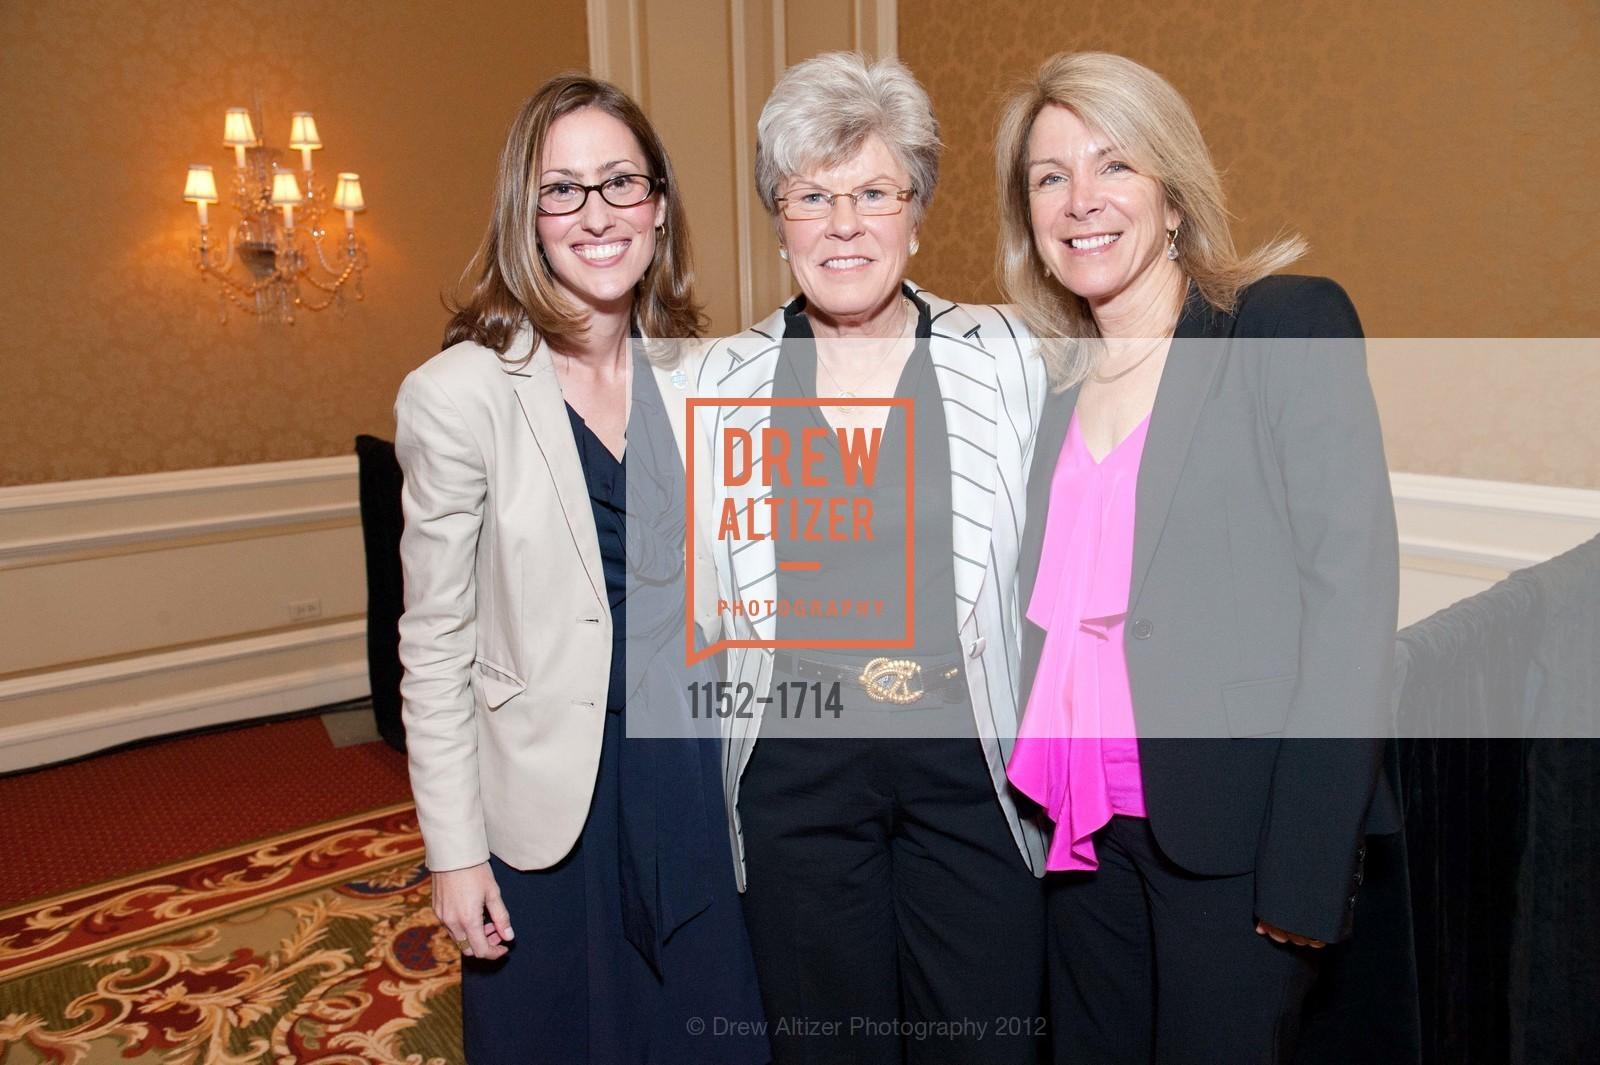 Emily Bobel, Sharon Saunders, Ann Seclow, Photo #1152-1714